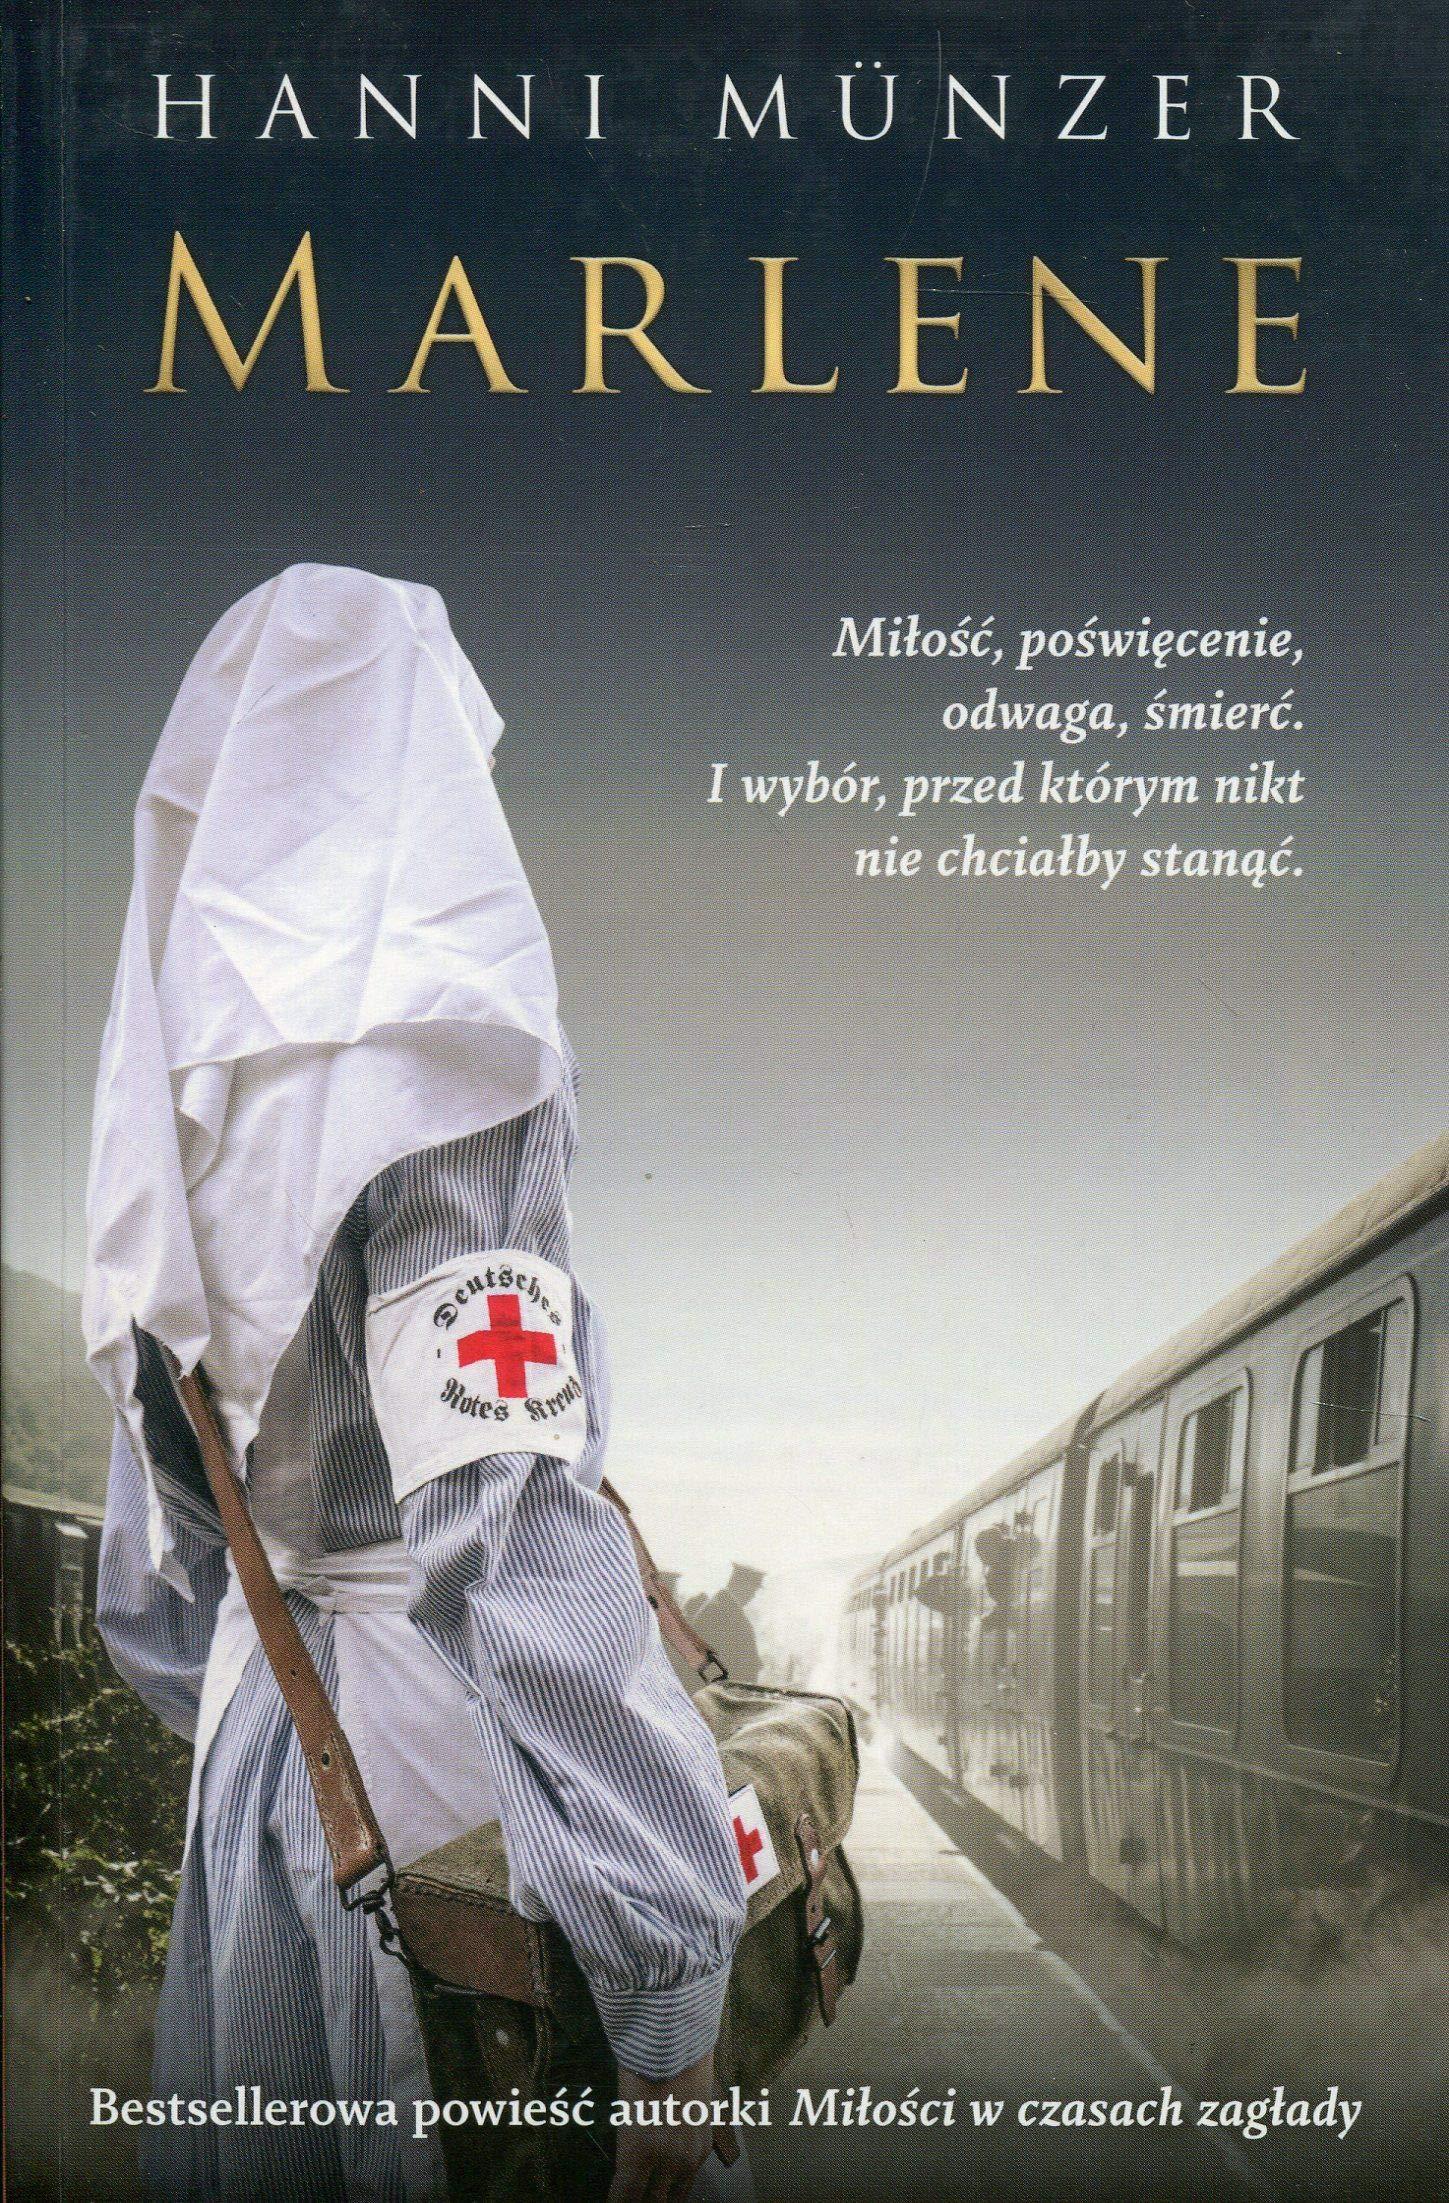 Hanni Munzer Marlene Art Book Pdf Read Online Ebook Or